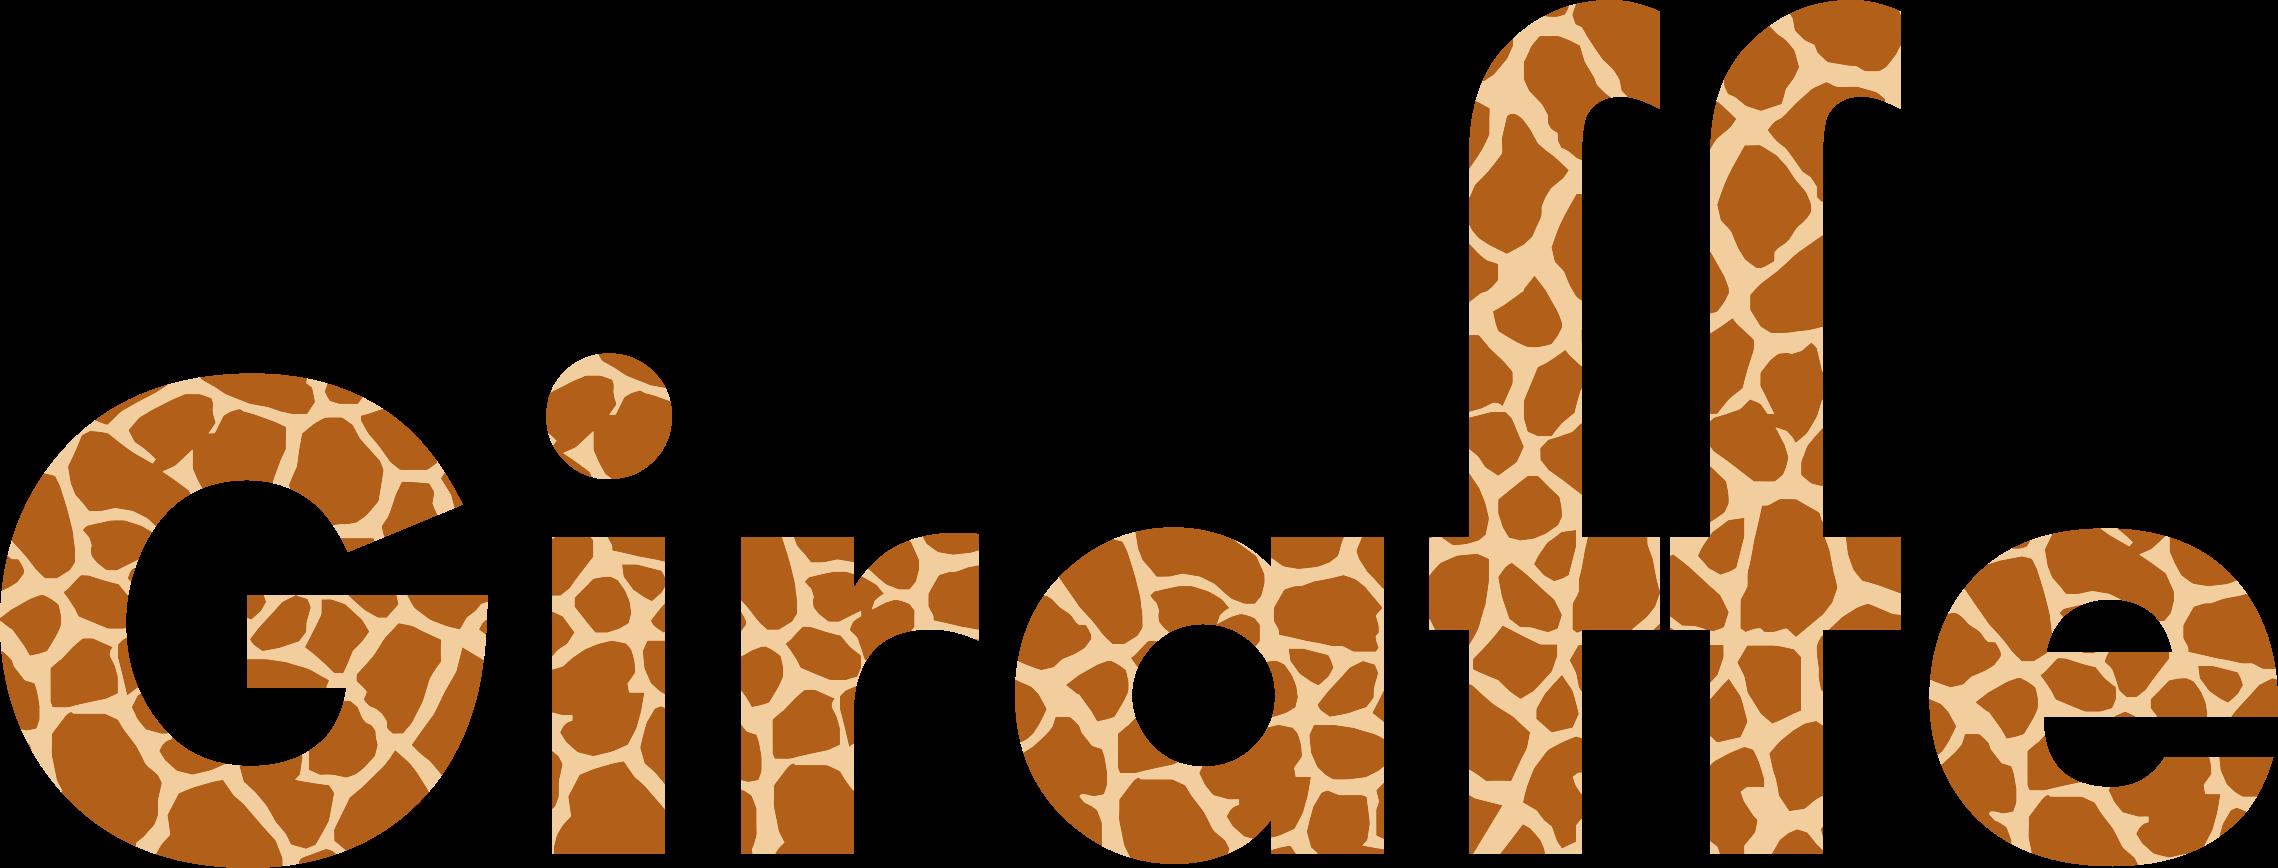 Typography big image png. Clipart giraffe skin